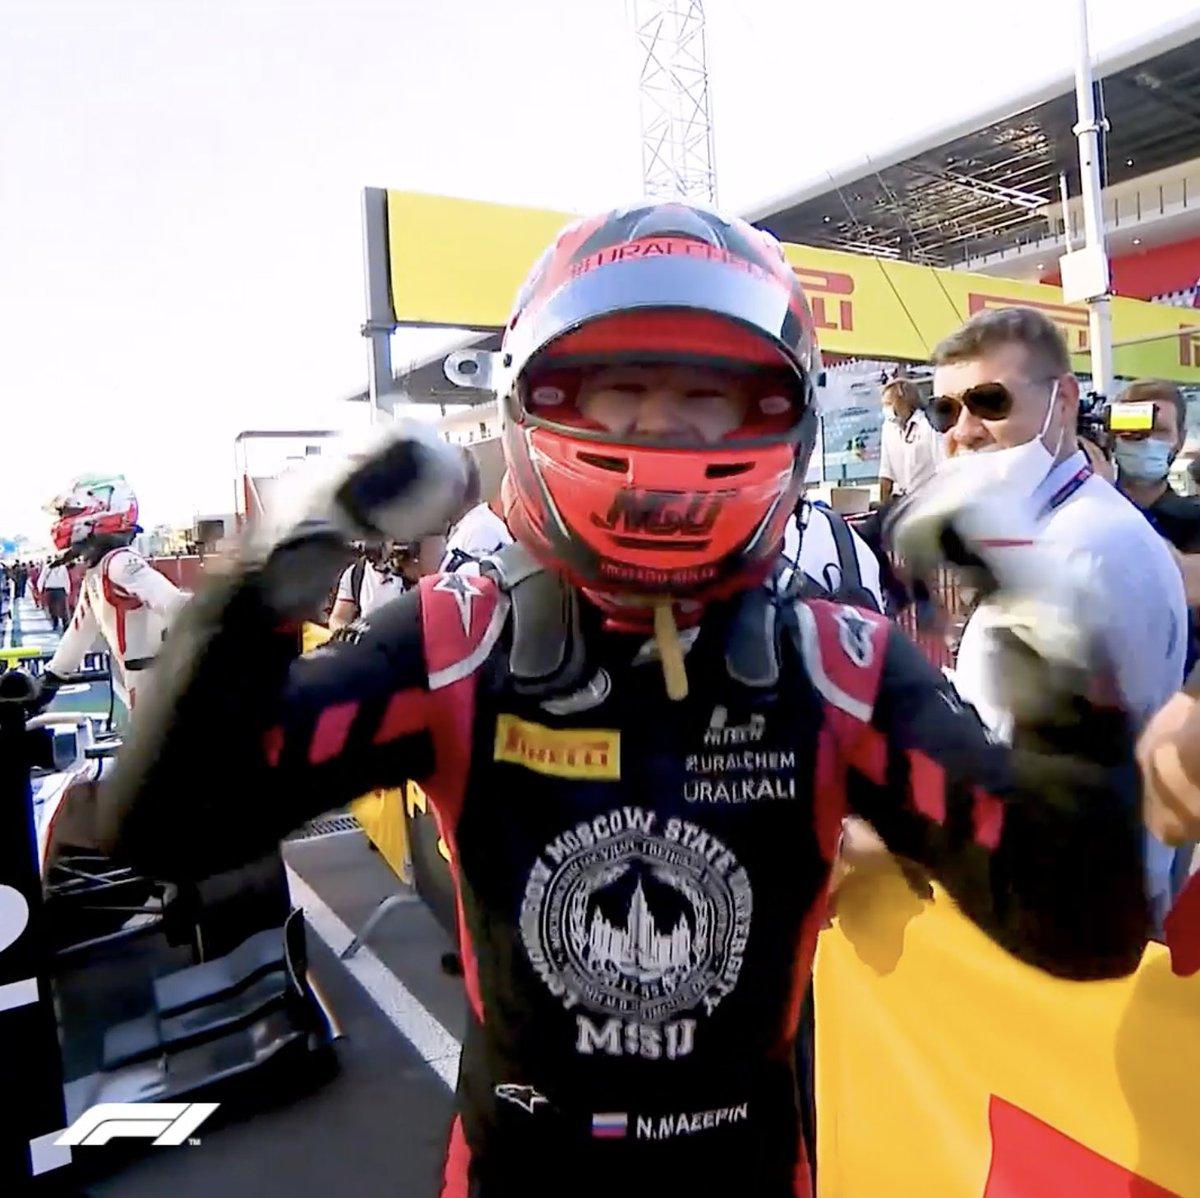 Welcome to F1, Nikita!  #F1 @HaasF1Team https://t.co/ah9EBkpxz1